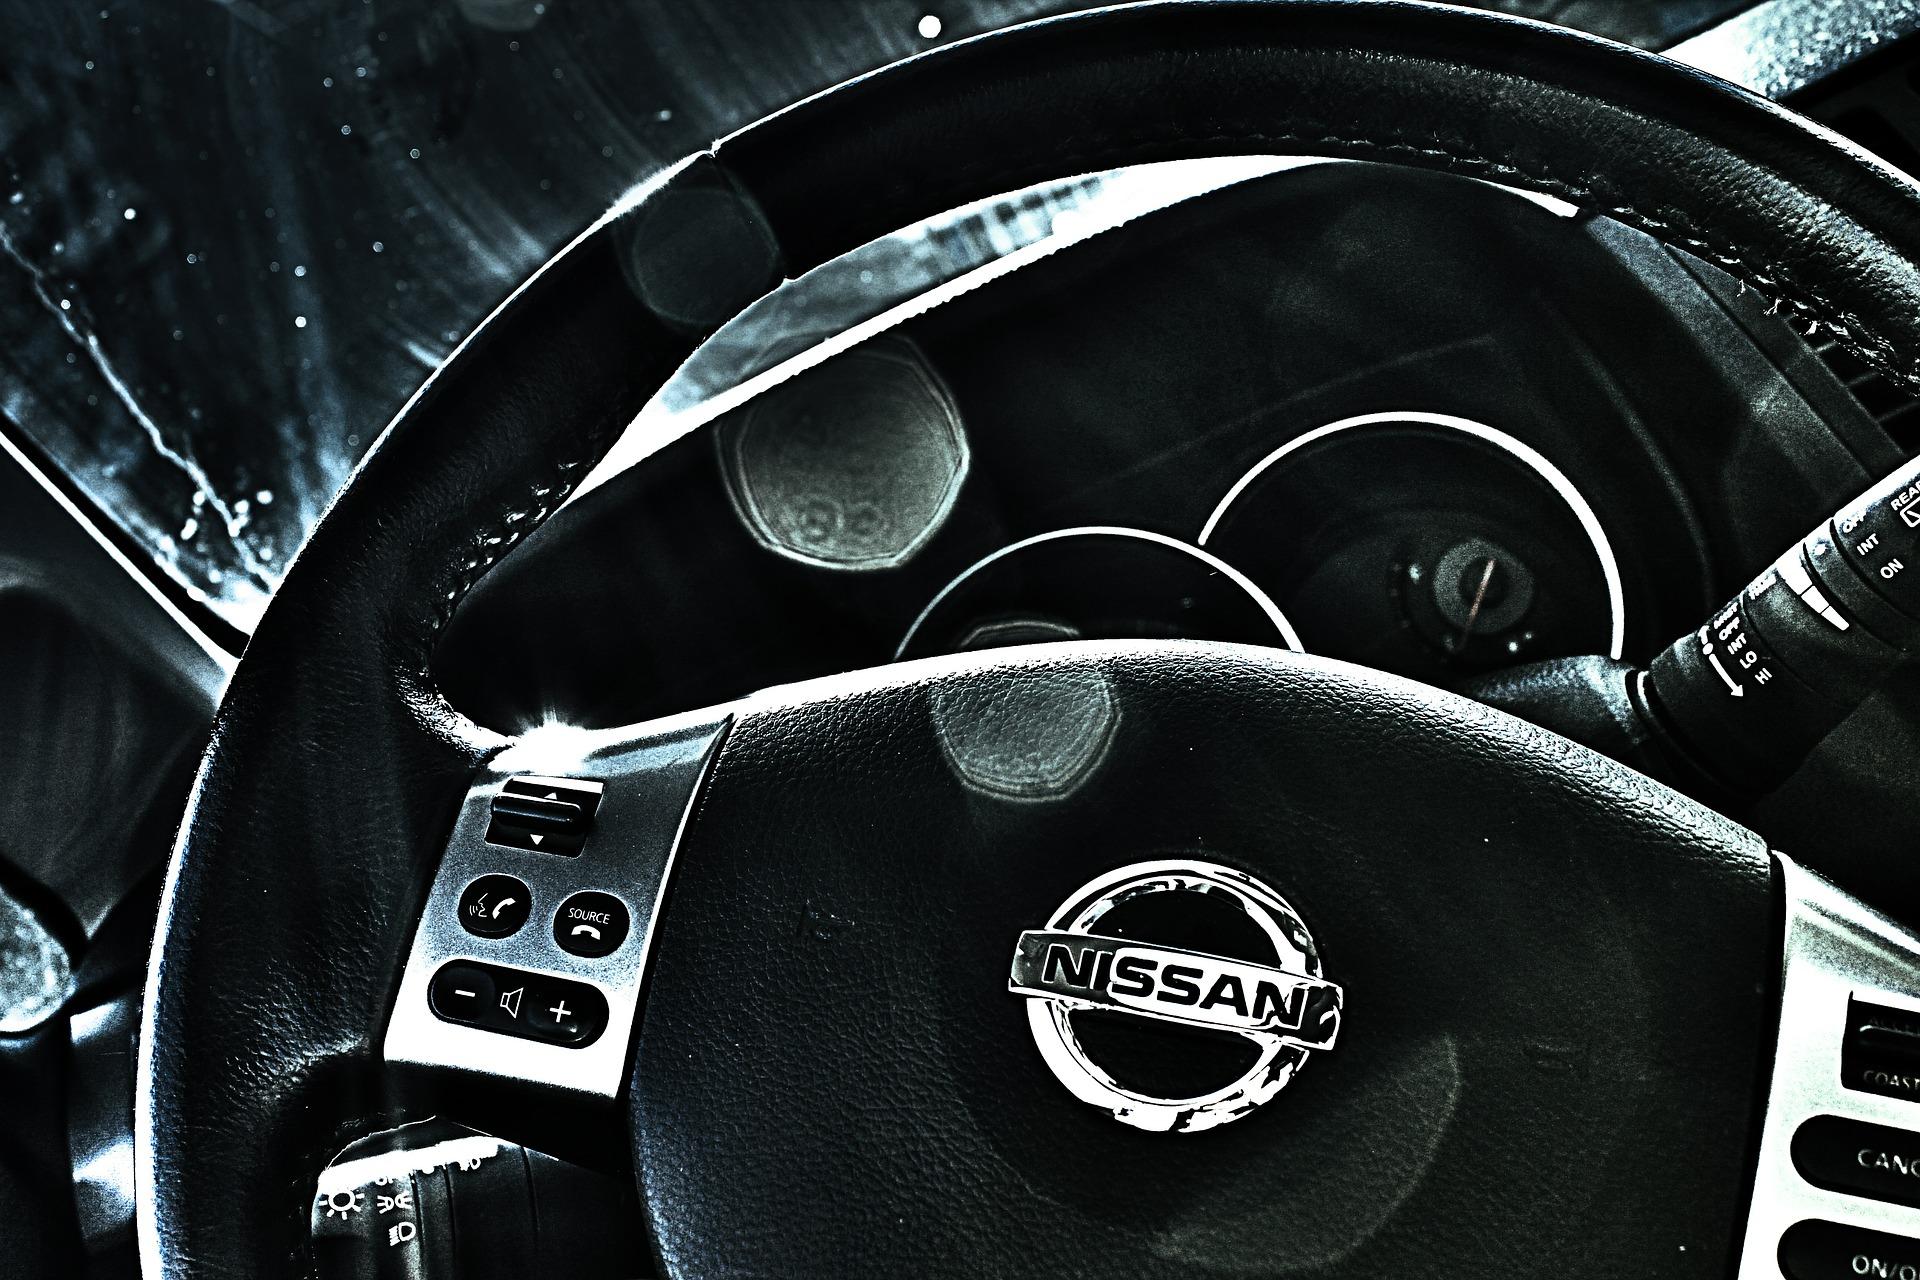 nissan-440488_1920